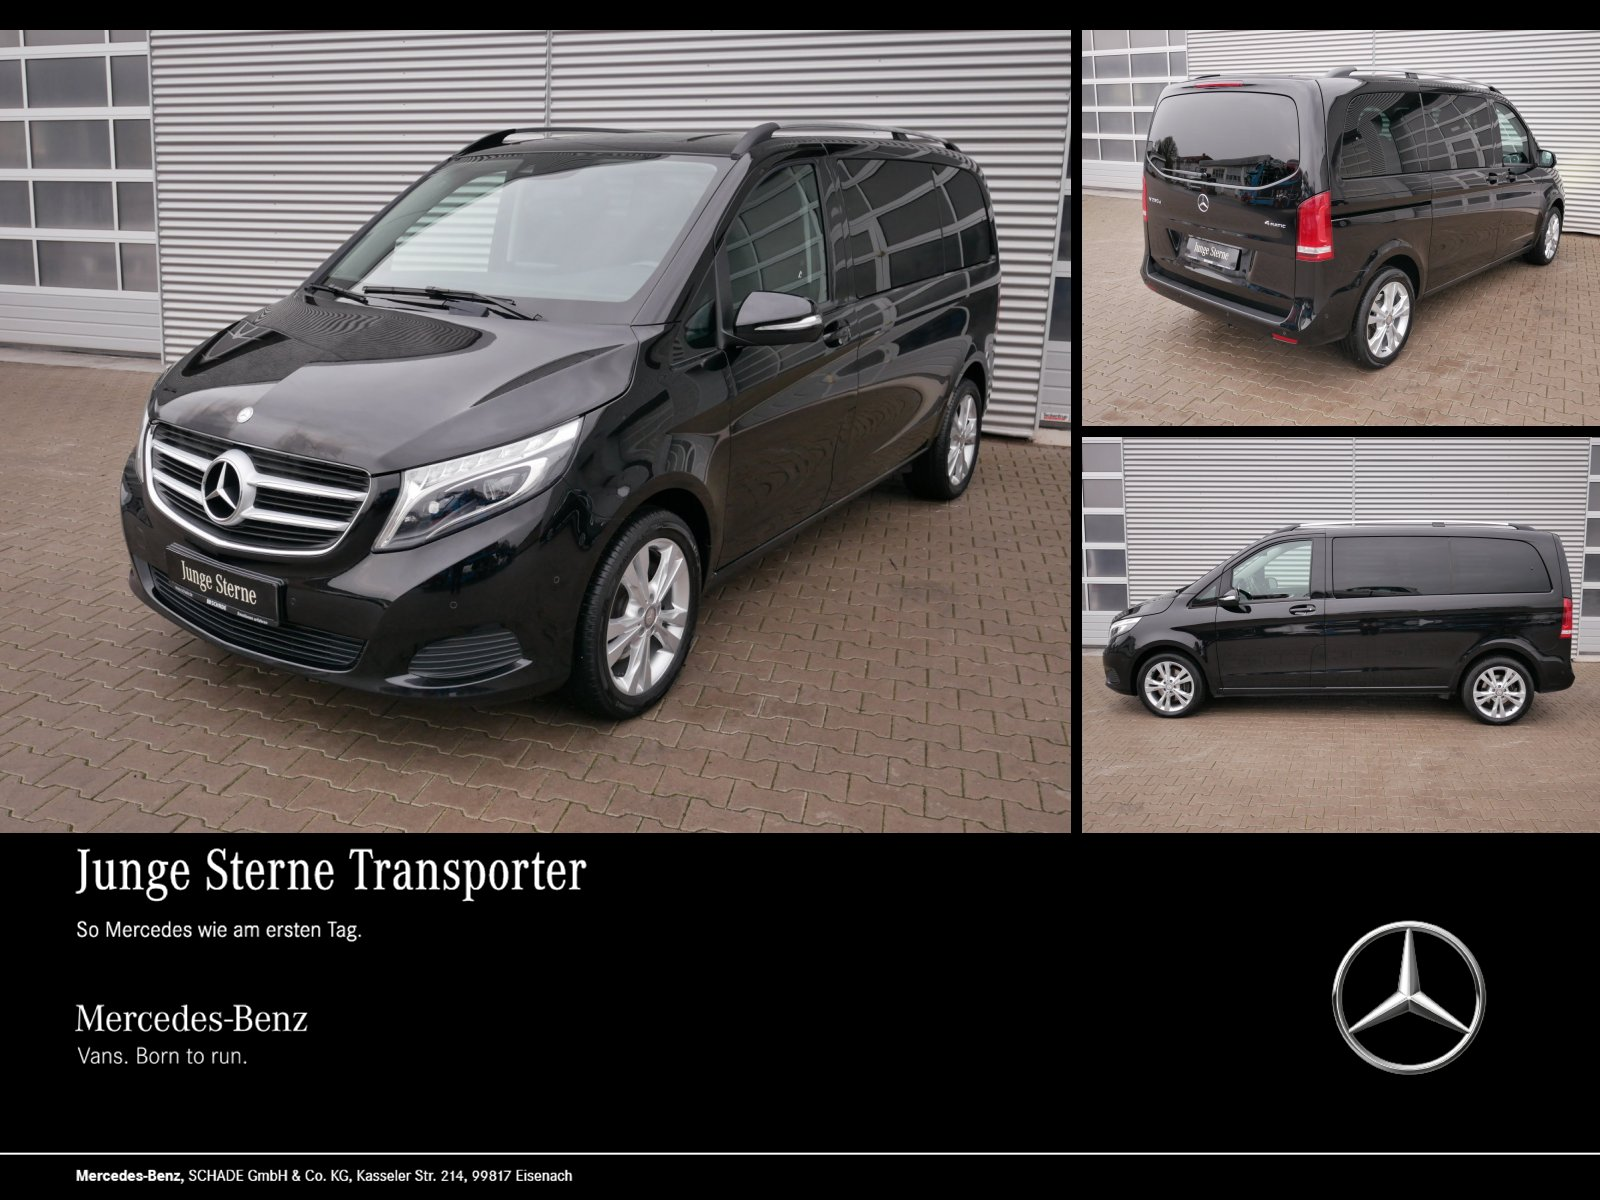 "Mercedes-Benz V 250 EDITION 4 MATIC LED AHK NAVI 18"" ALU EURO6, Jahr 2015, diesel"